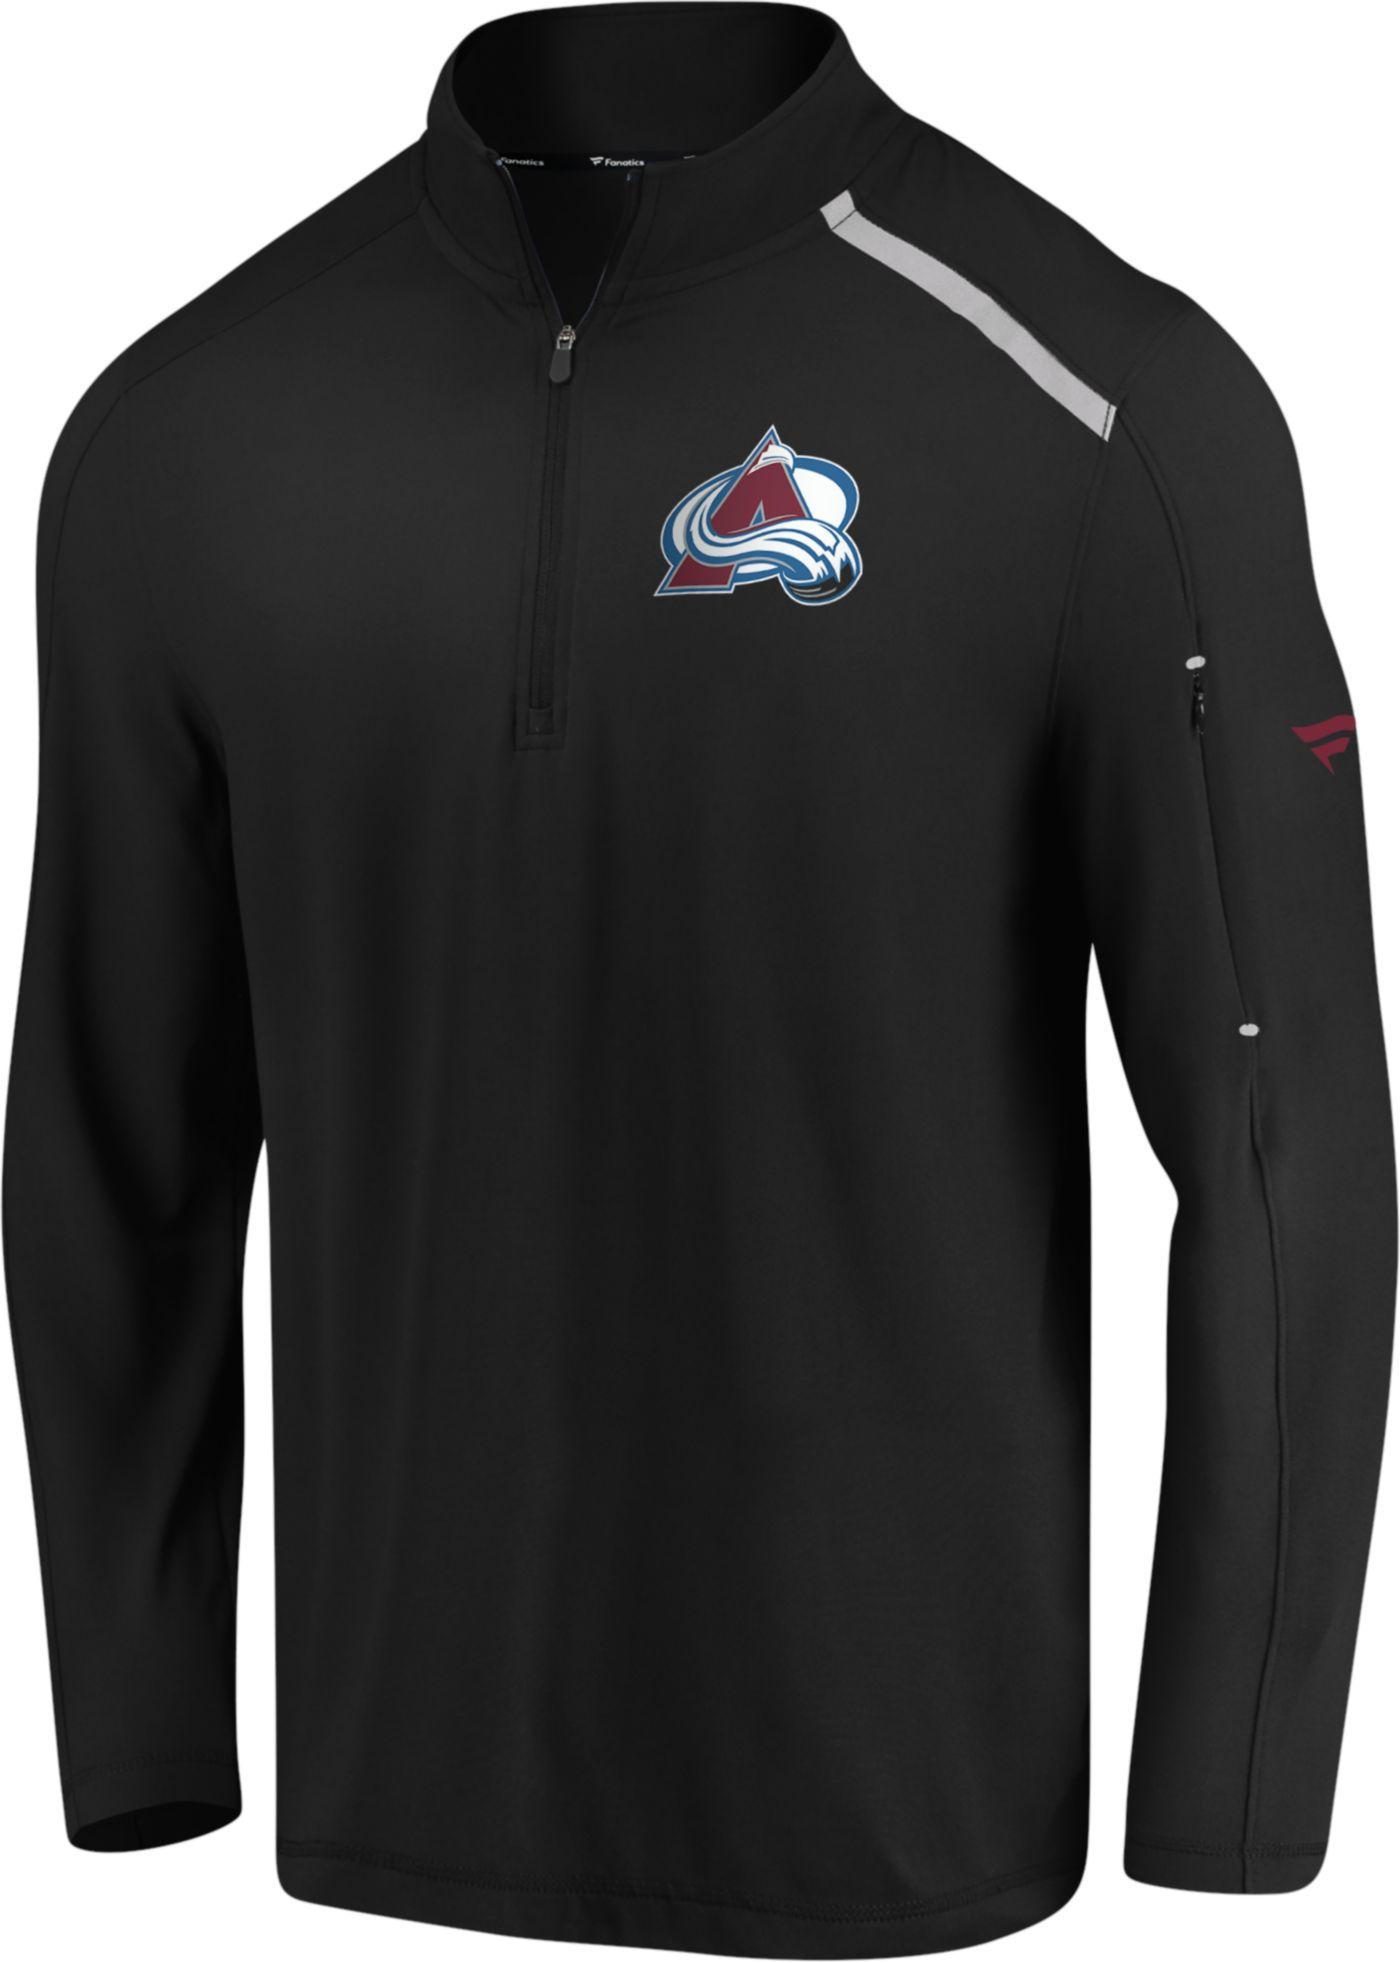 NHL Men's Colorado Avalanche Authentic Pro Clutch Black Quarter-Zip Pullover